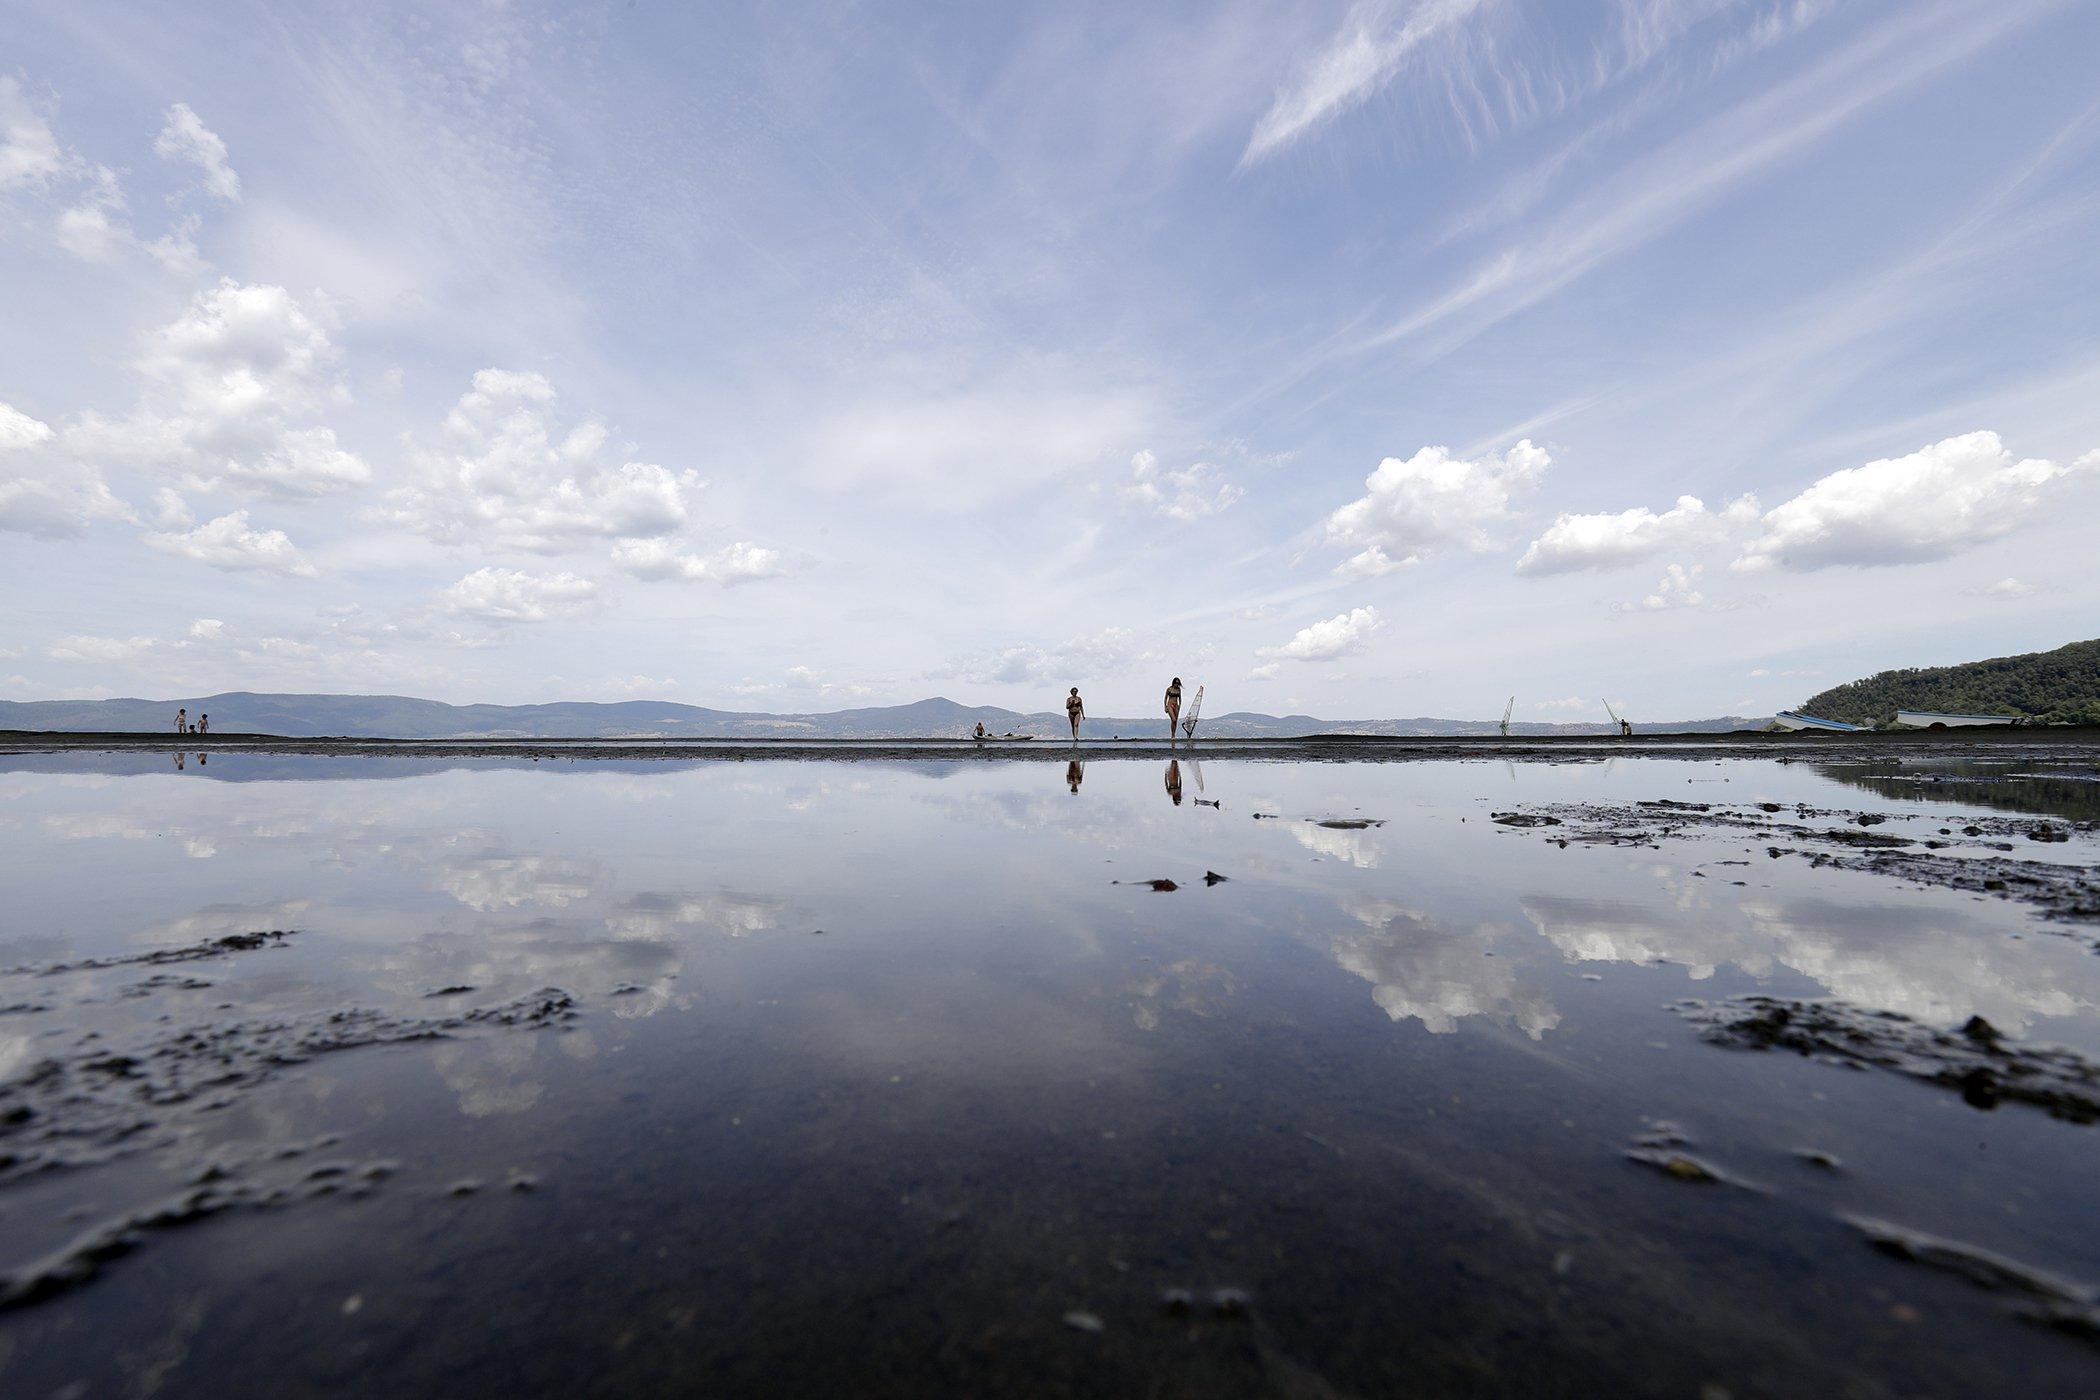 Environmental-Photos-Of-The-Year-11.jpg